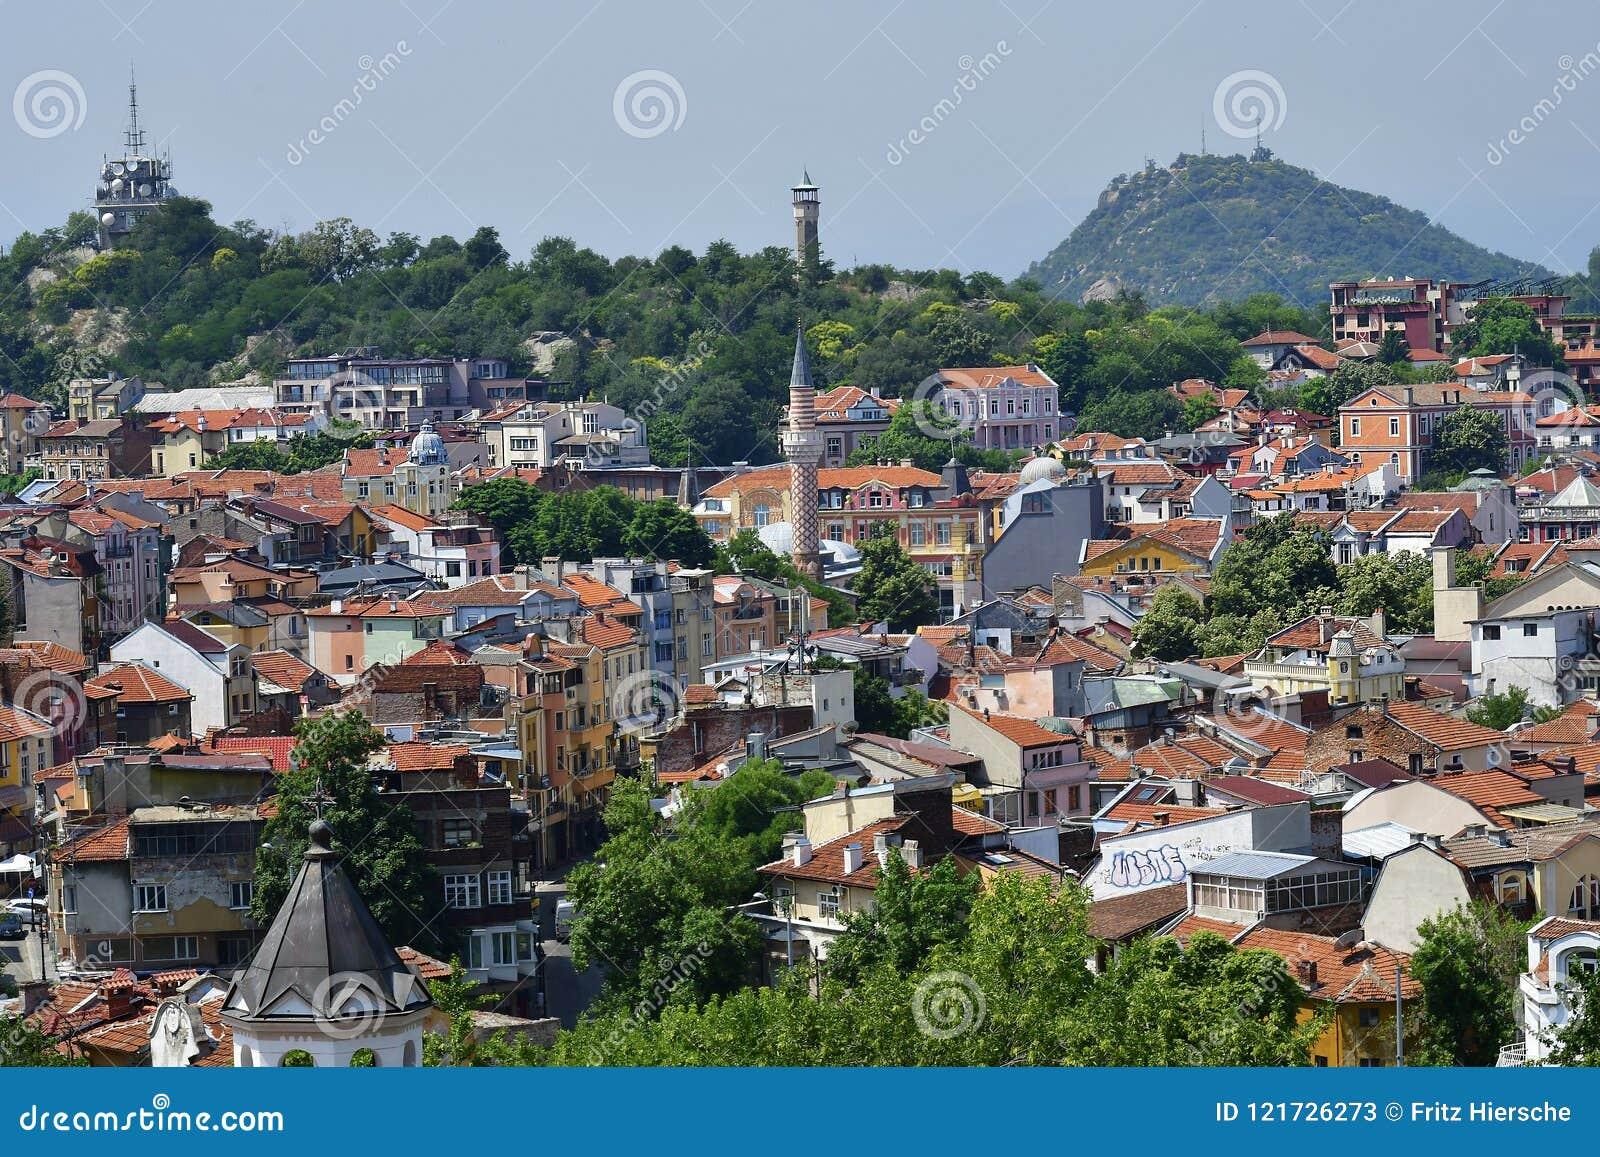 Bułgaria, Plovdiv, pejzaż miejski